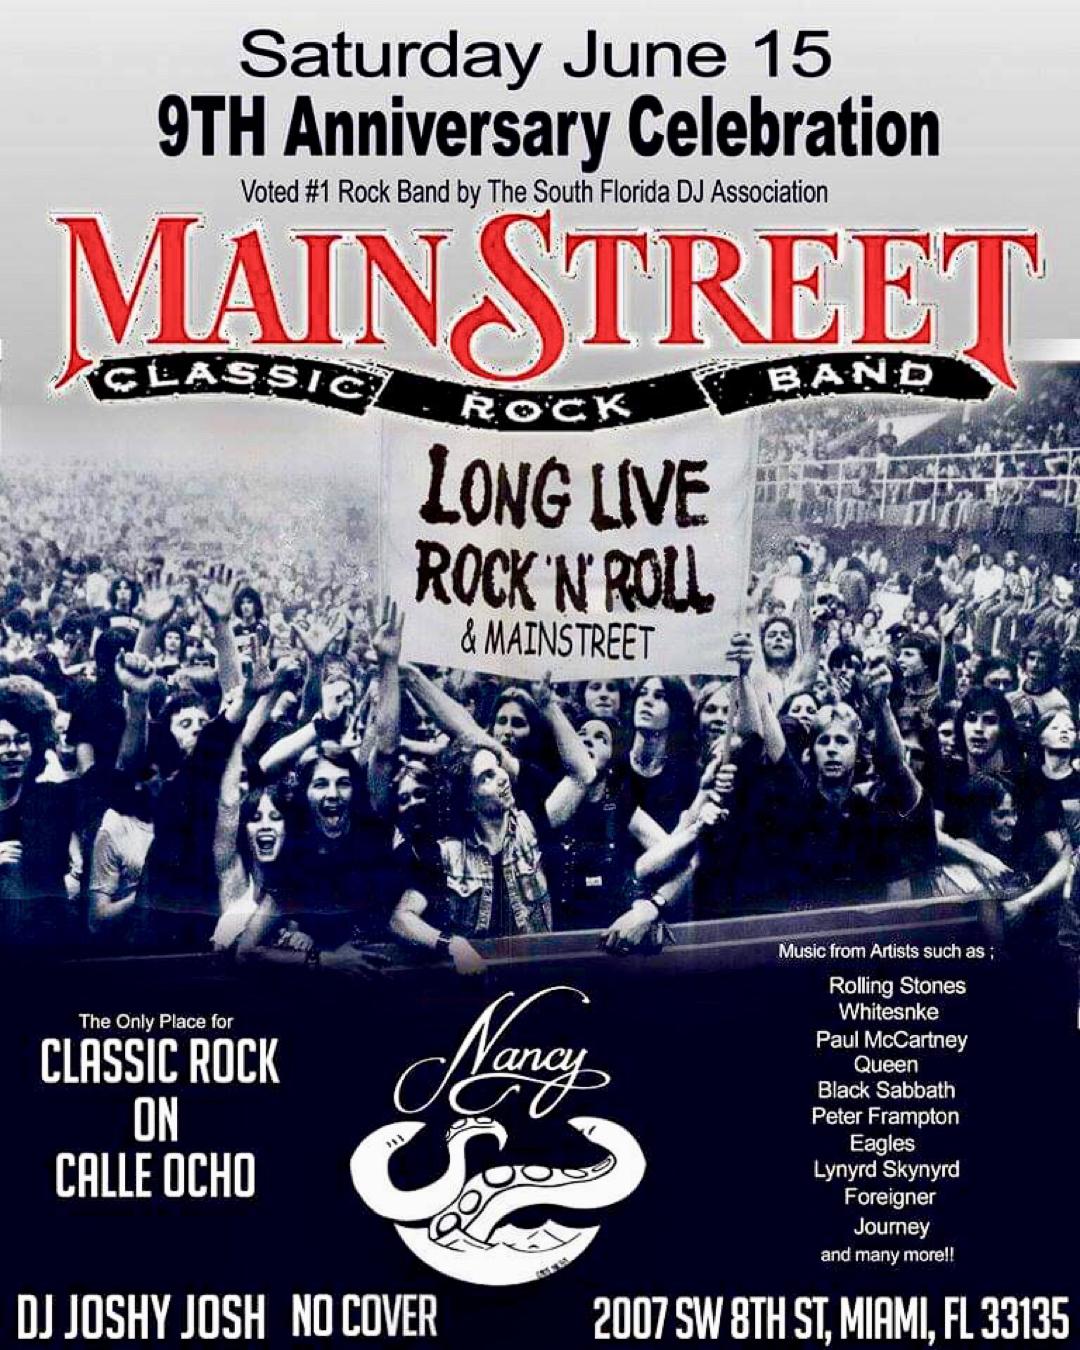 MainStreet! 9th Anniversary Celebration! at Bar Nancy - Saturday, June 15 - No Cover - 10 PM